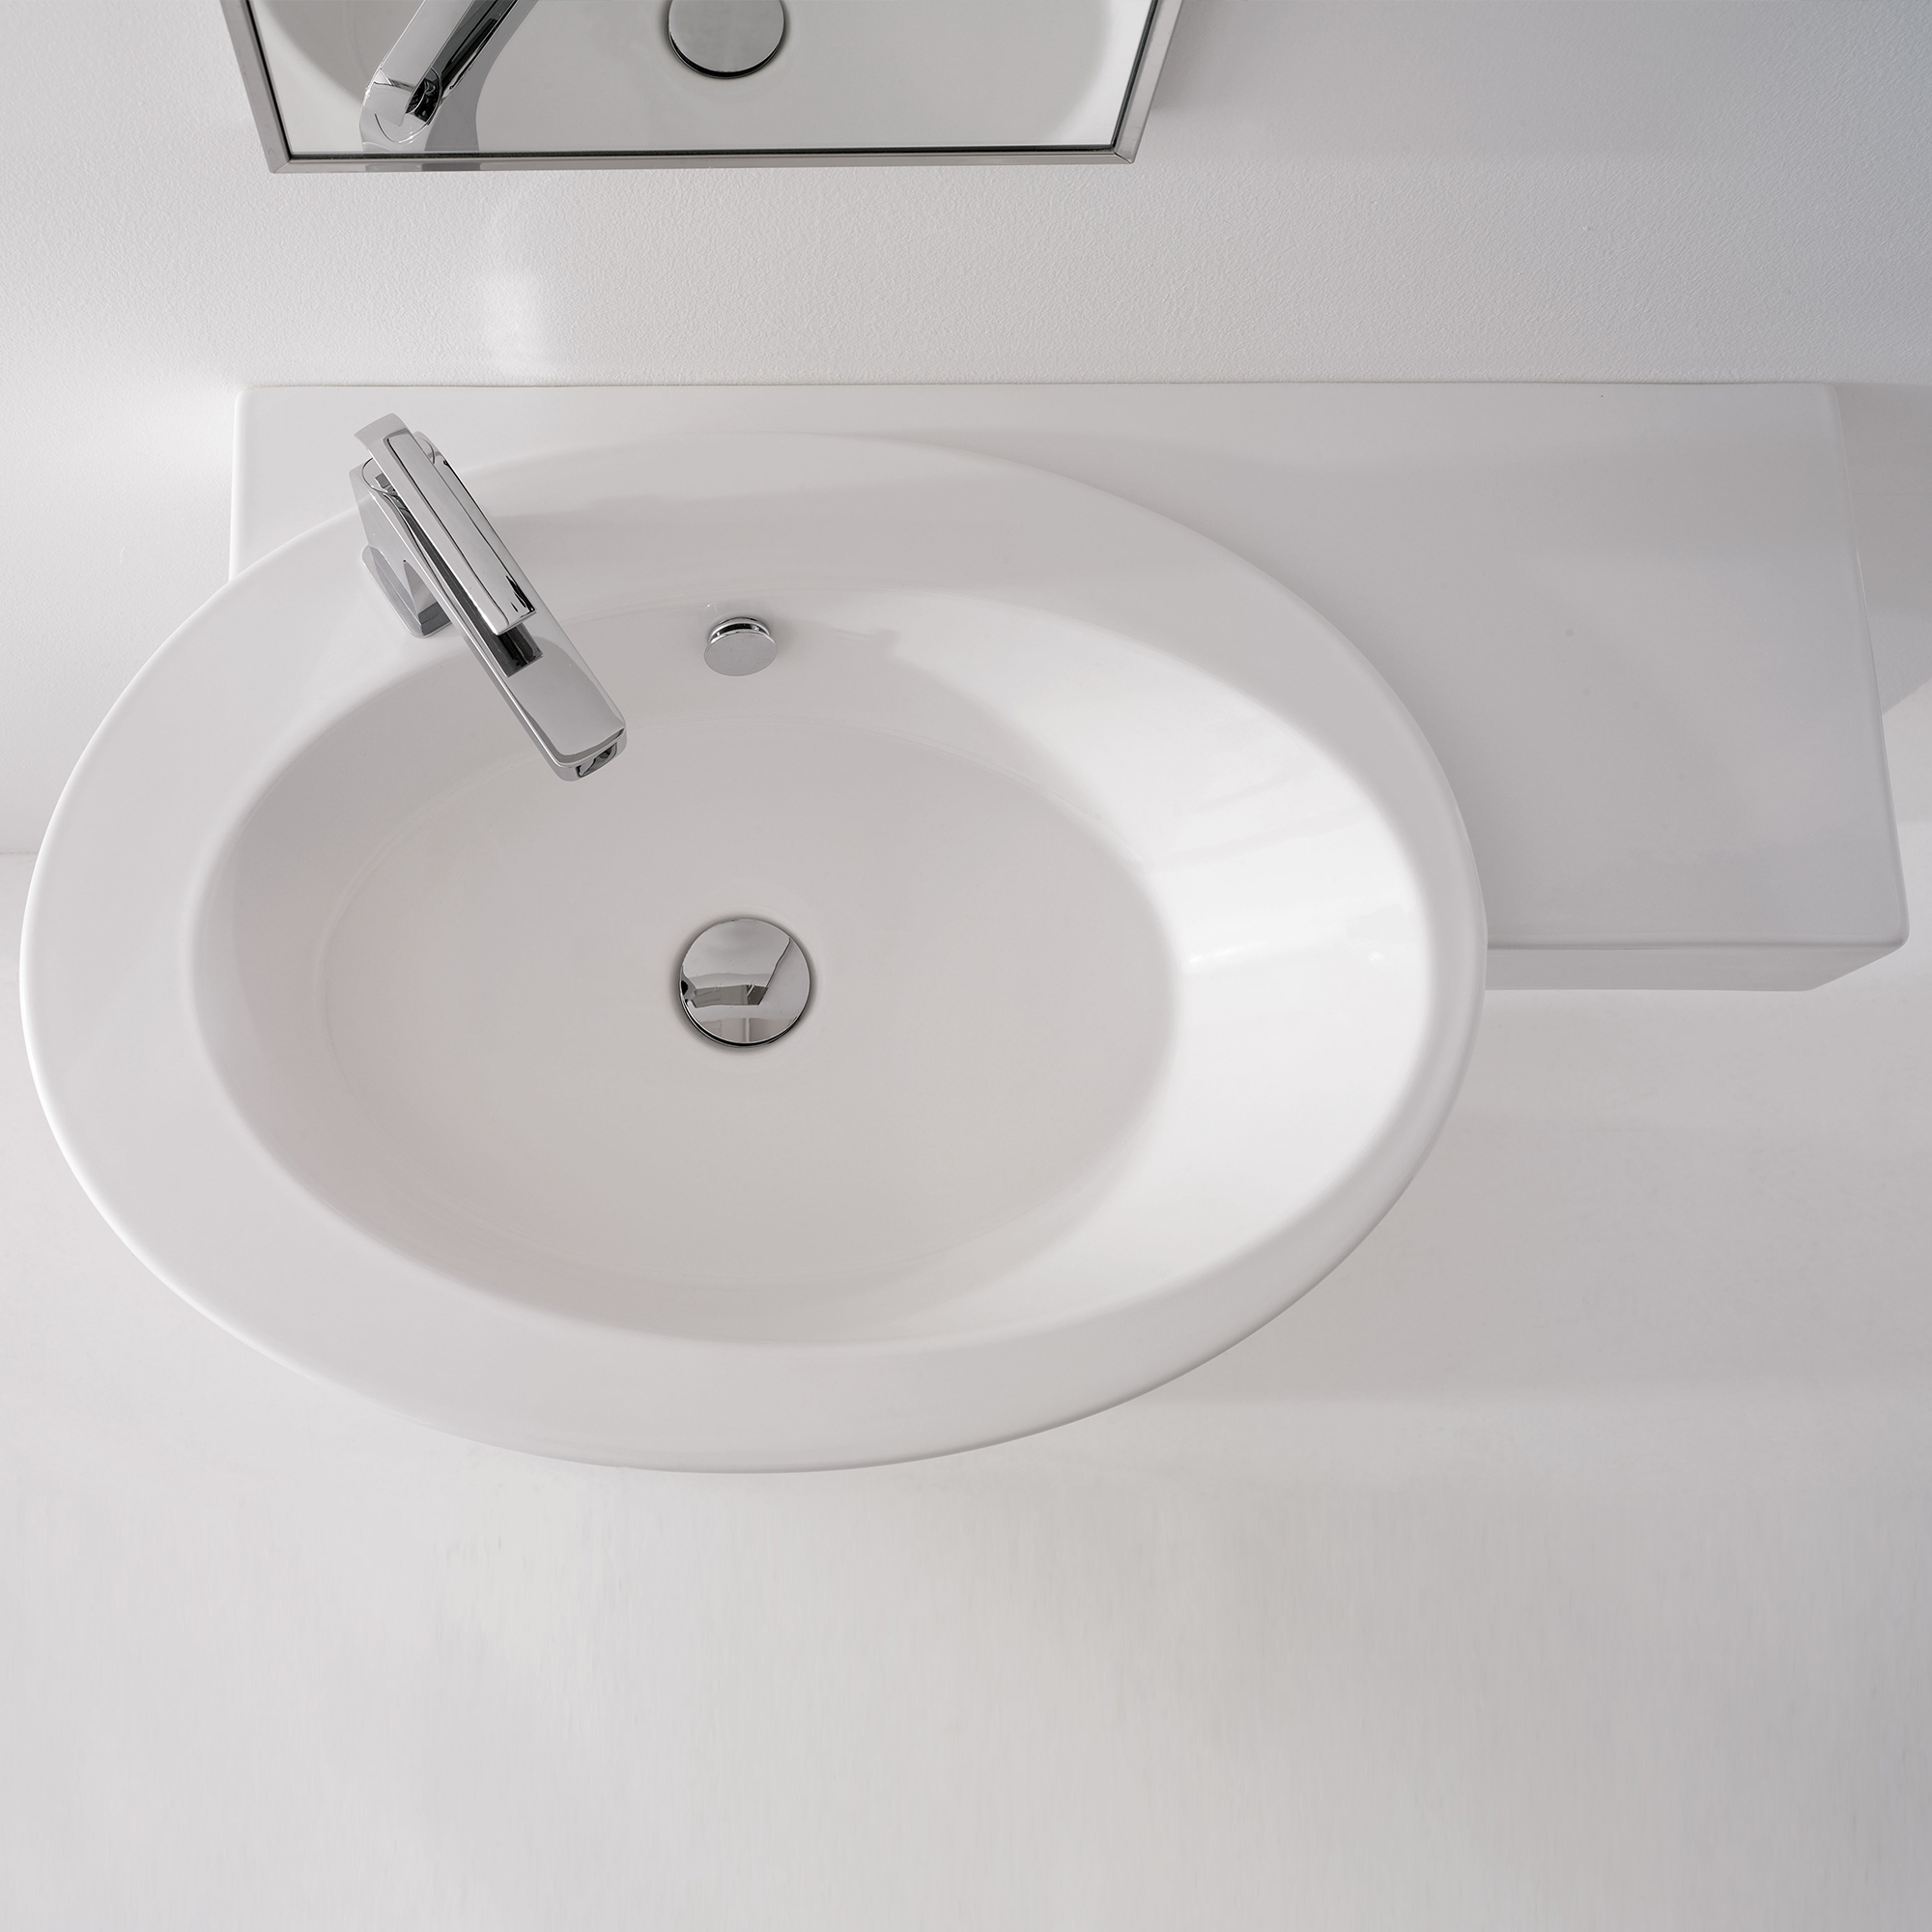 scarabeo wish waschtisch kragstain rechts 2011 reuter onlineshop. Black Bedroom Furniture Sets. Home Design Ideas